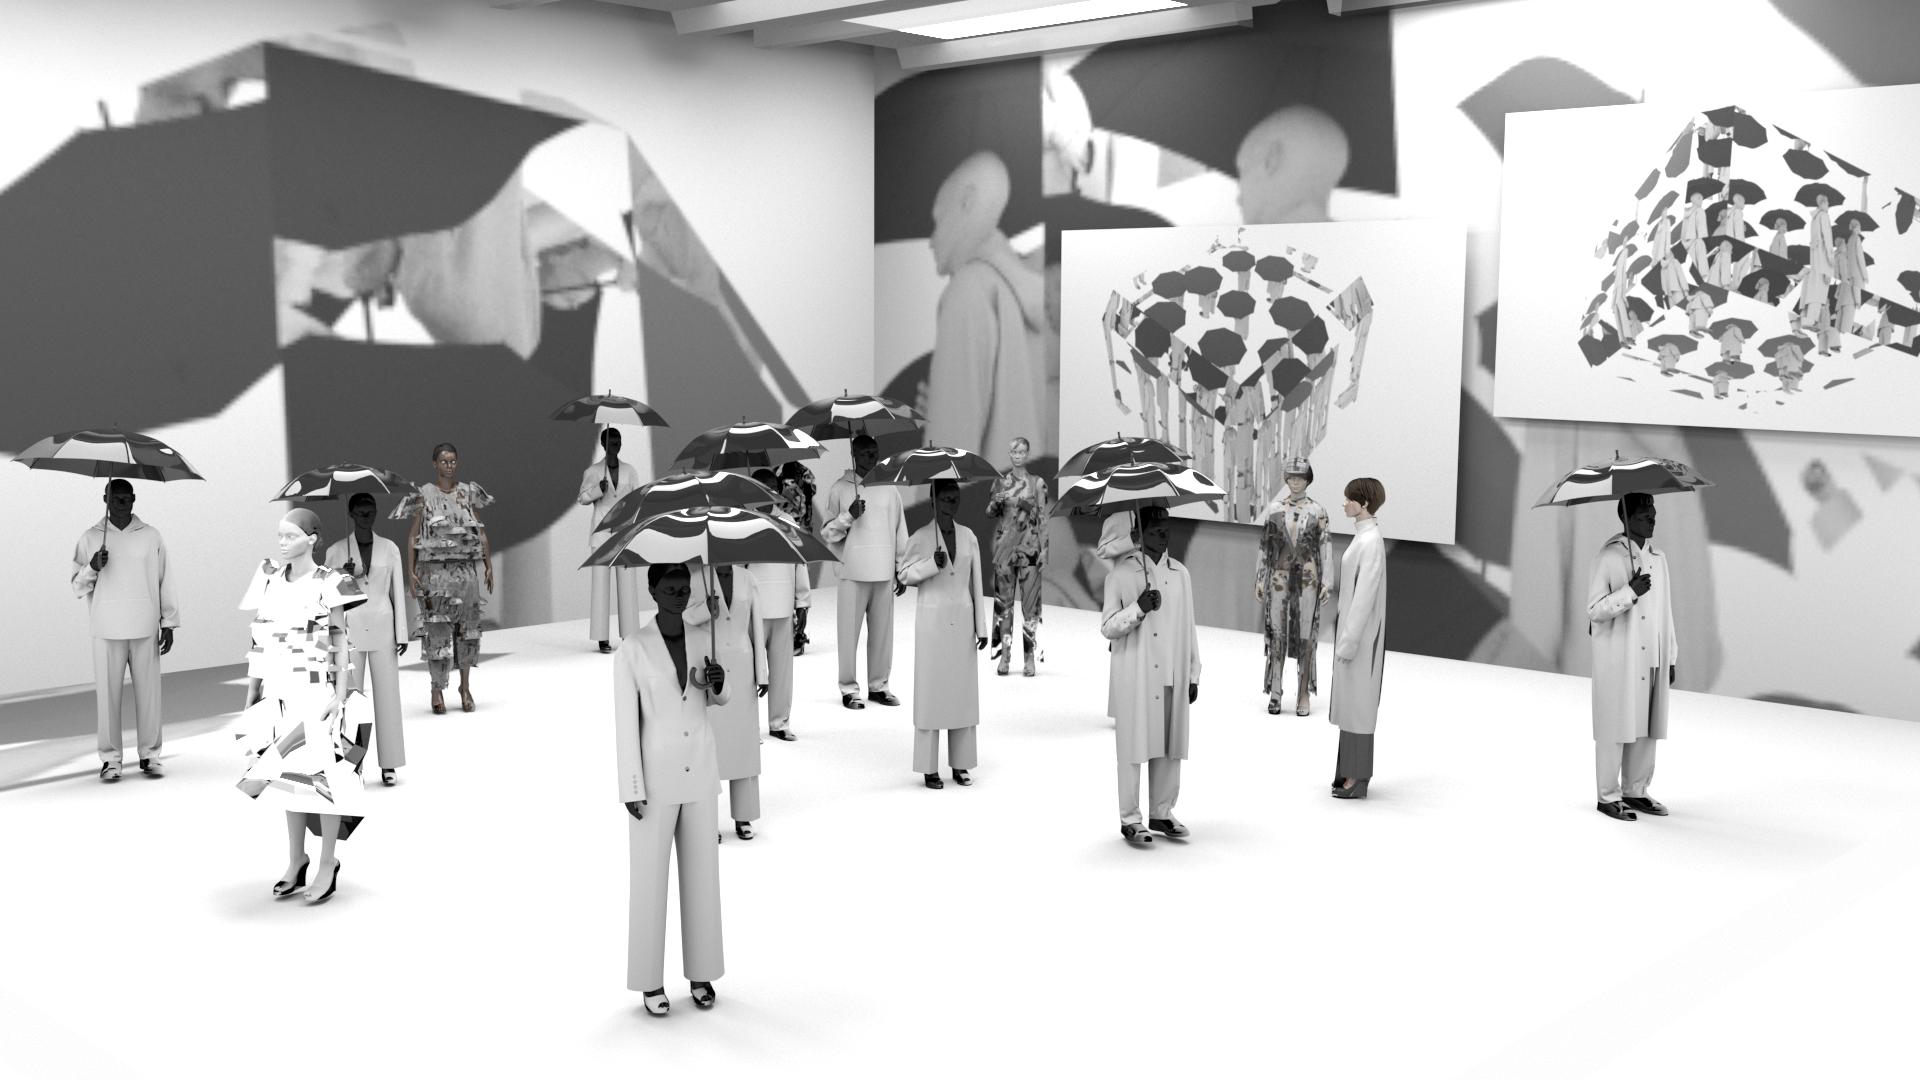 Stills from Kijeong Choi's RCA MA Fashion graduate project